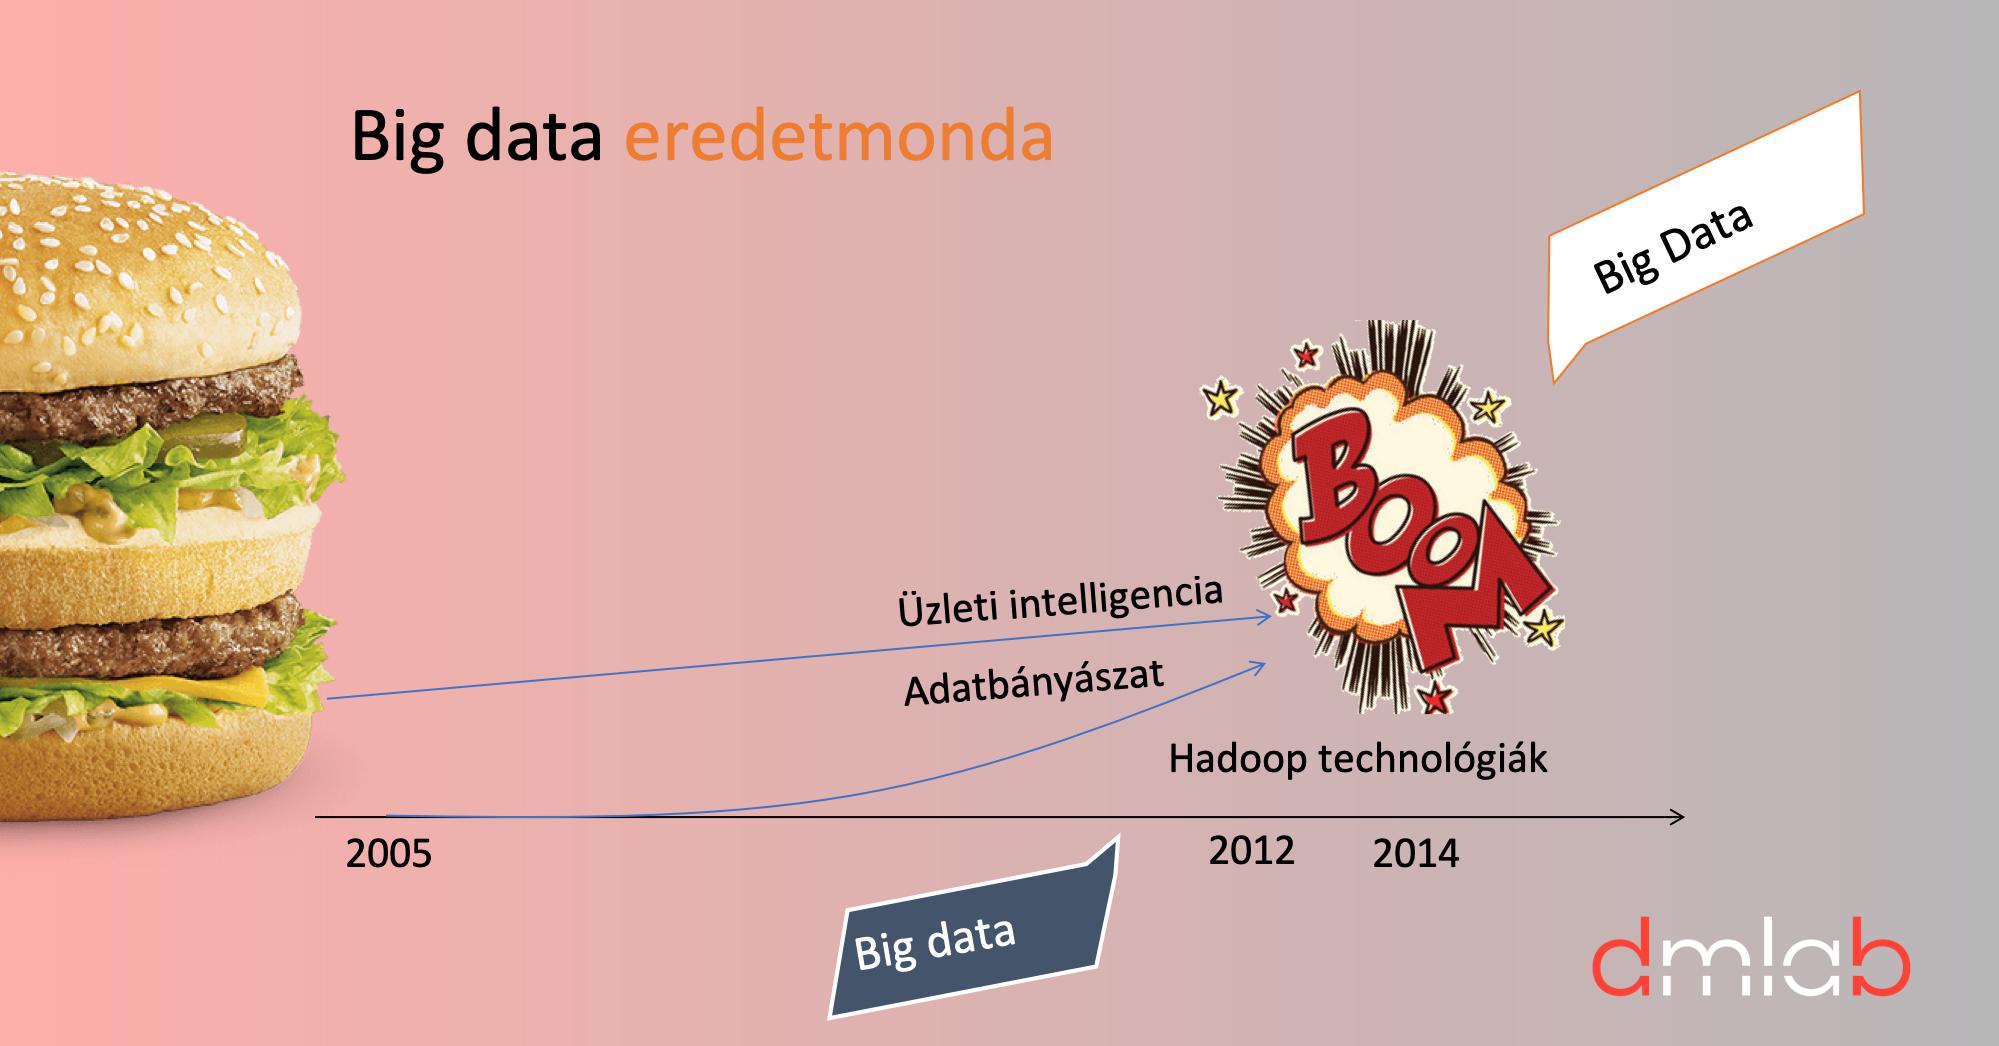 3_big_data_eredetmonda_ma_solat.jpg